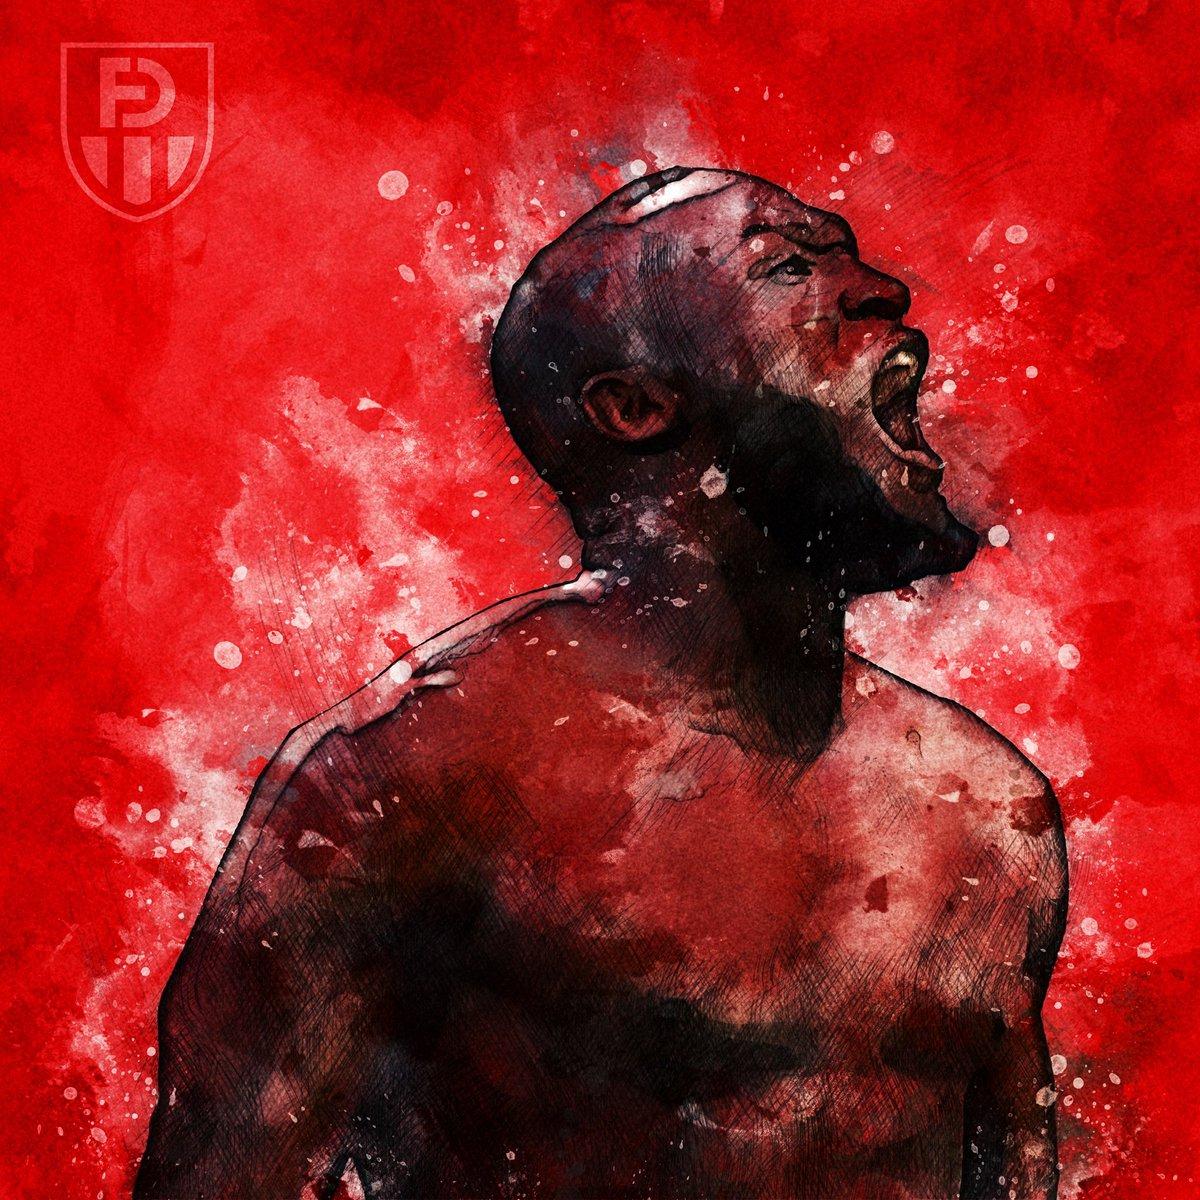 #MUFC #ManchesterUnited #Lukaku